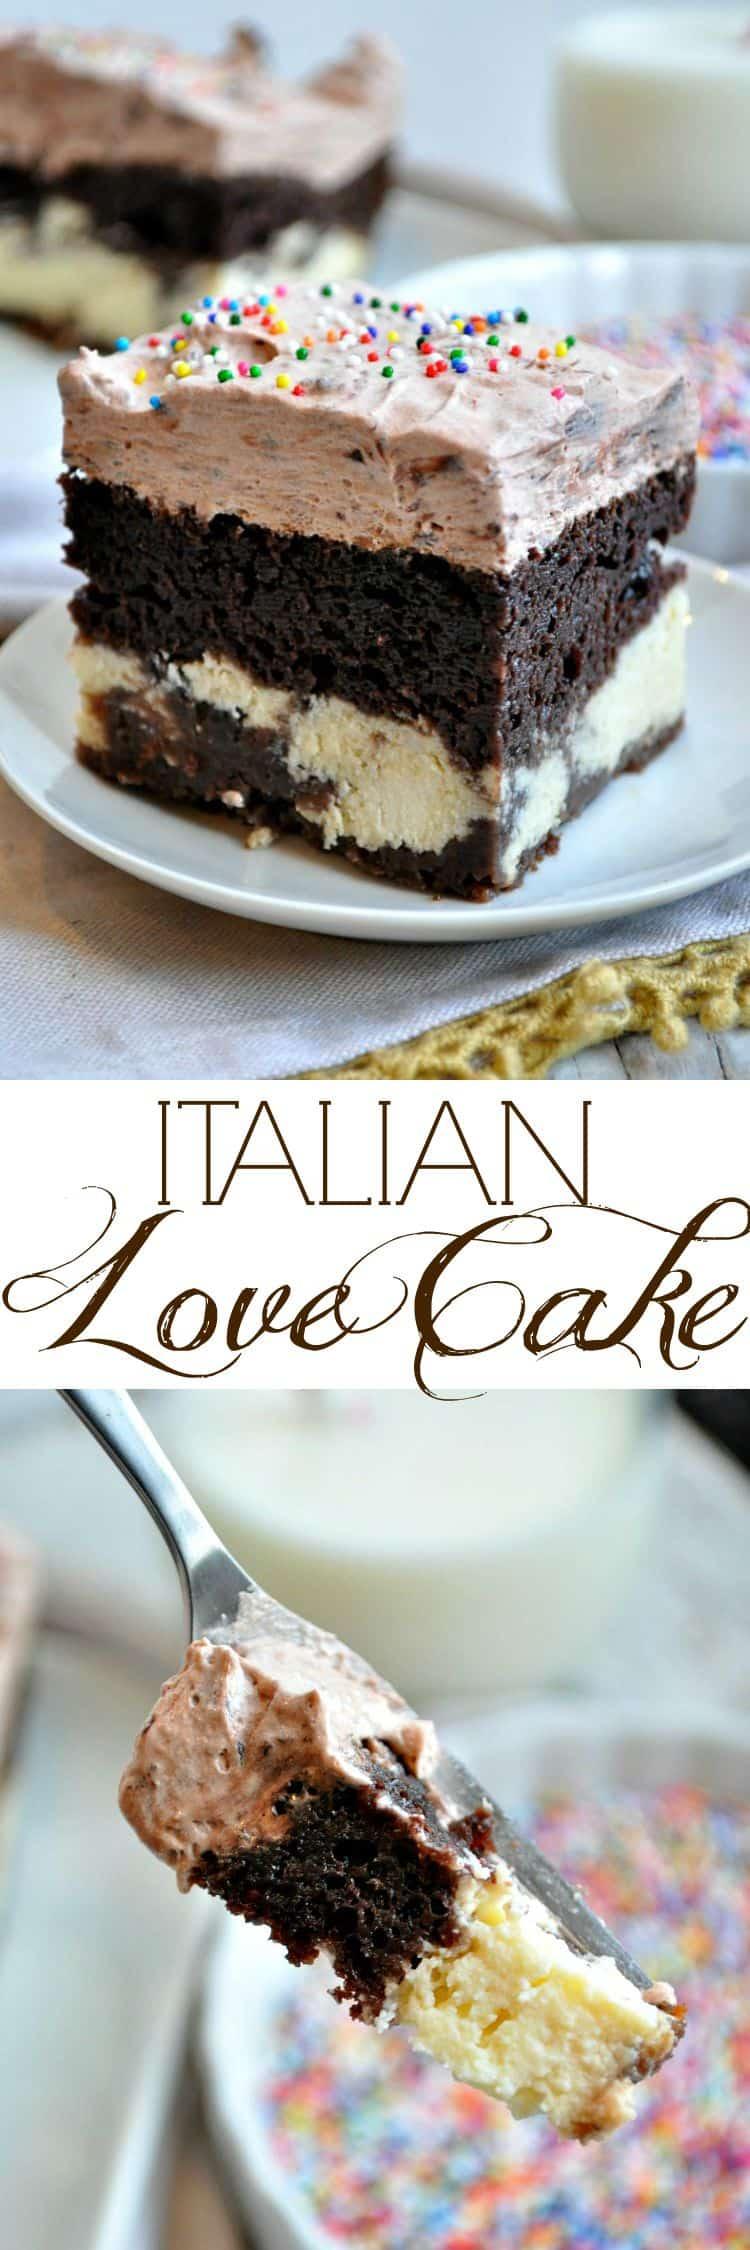 Italian desserts chocolate